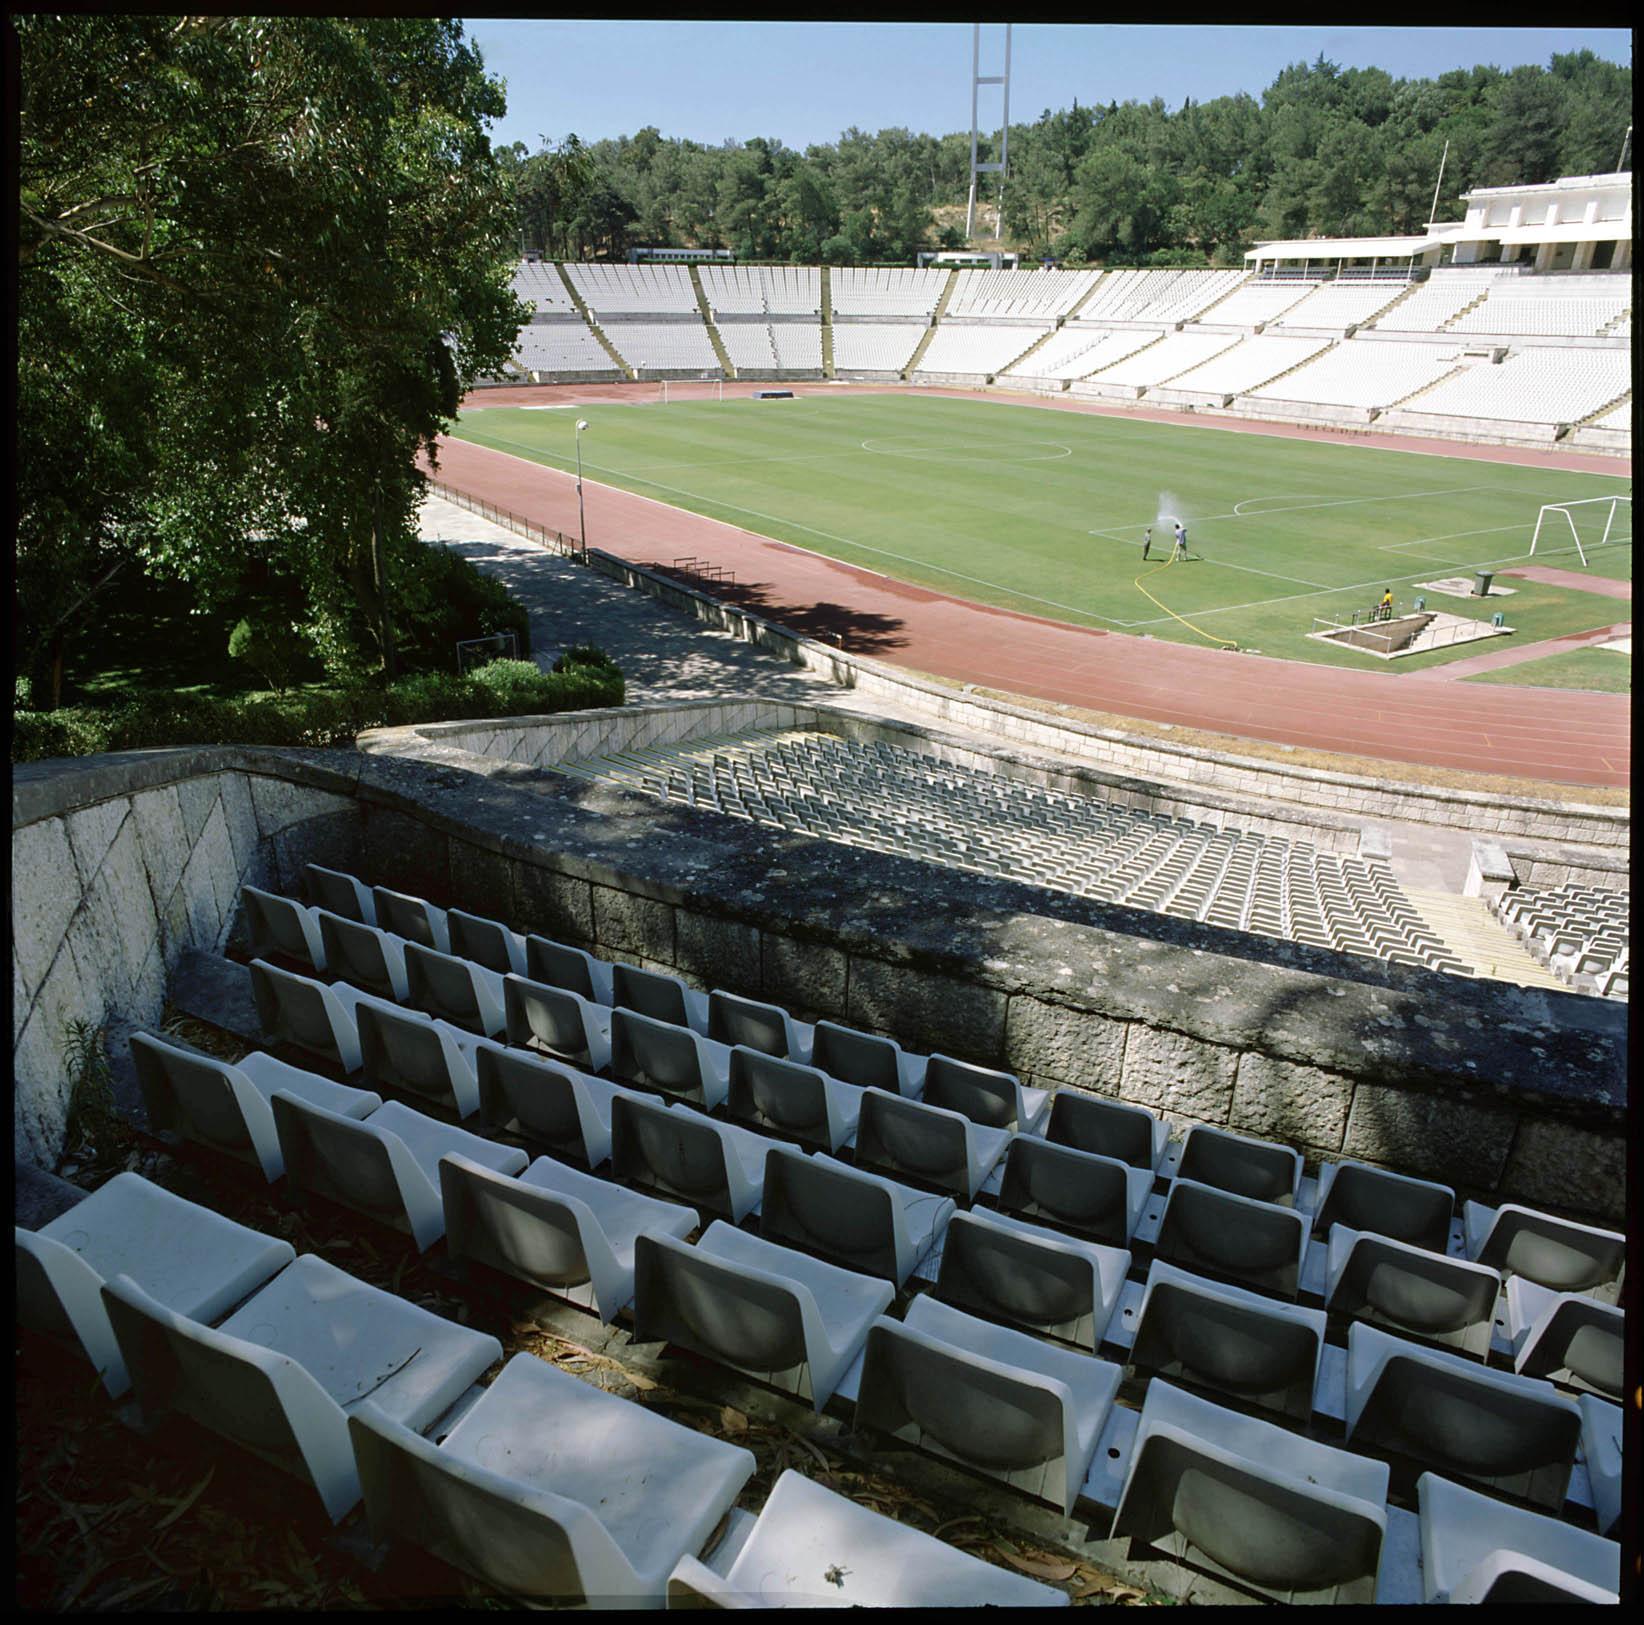 Est dio nacional lisboa portugal bancadas arquitecto for Puerta 27 estadio nacional